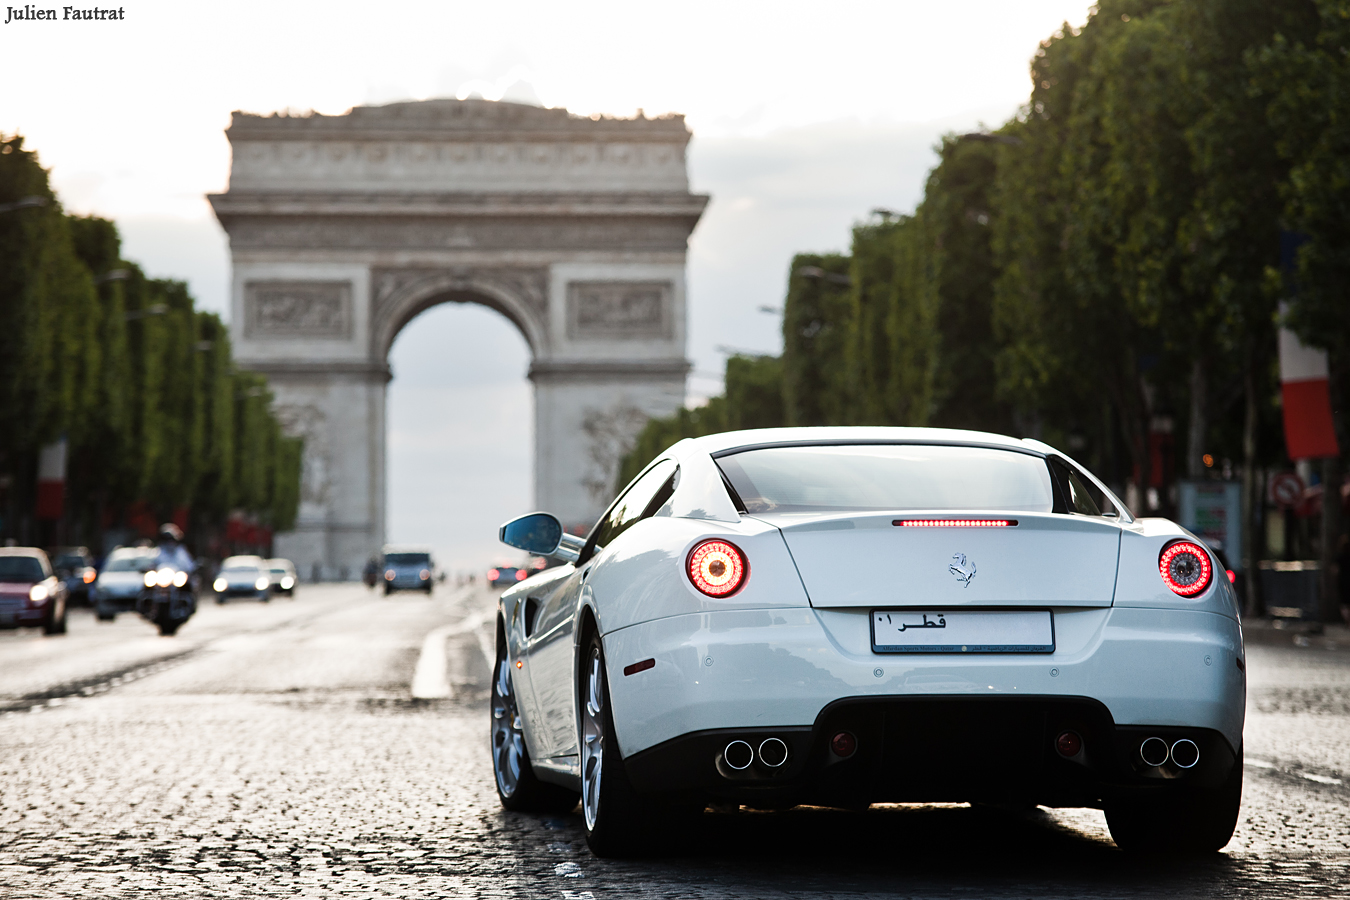 http://fautrat.free.fr/voiture-valk/image/g-photo/ferrari/599/ferrari-599-gtb-fiorano-1.jpg